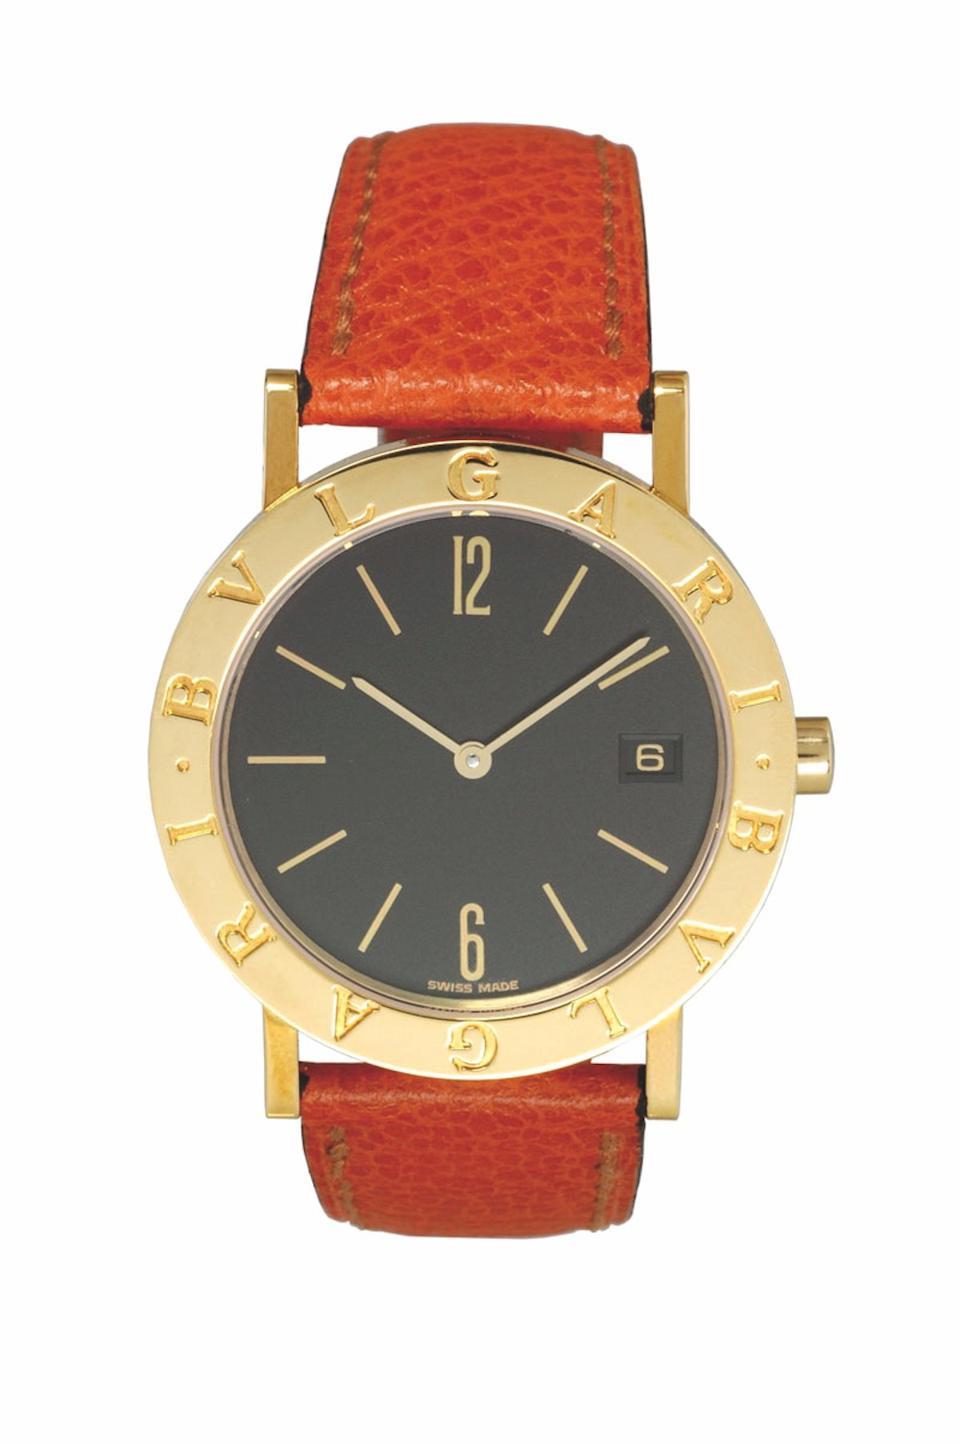 The 1977 Bulgari Bulgari watch